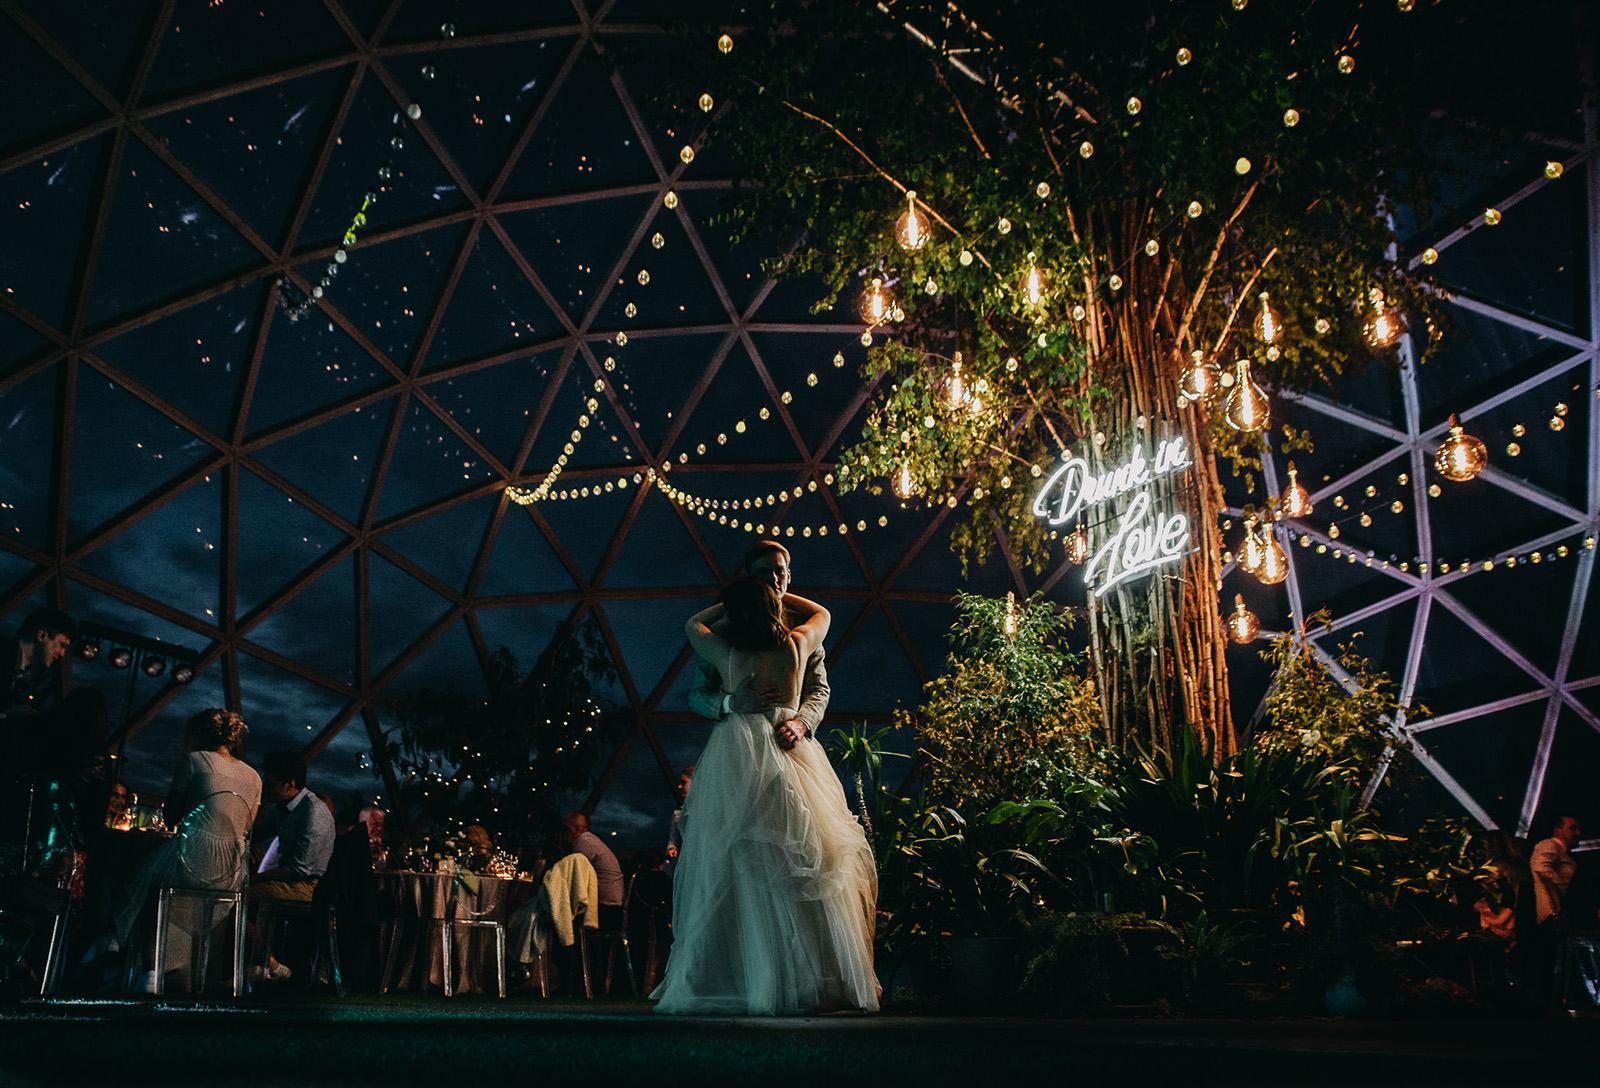 81 Memorable And Precious Moments At Weddings